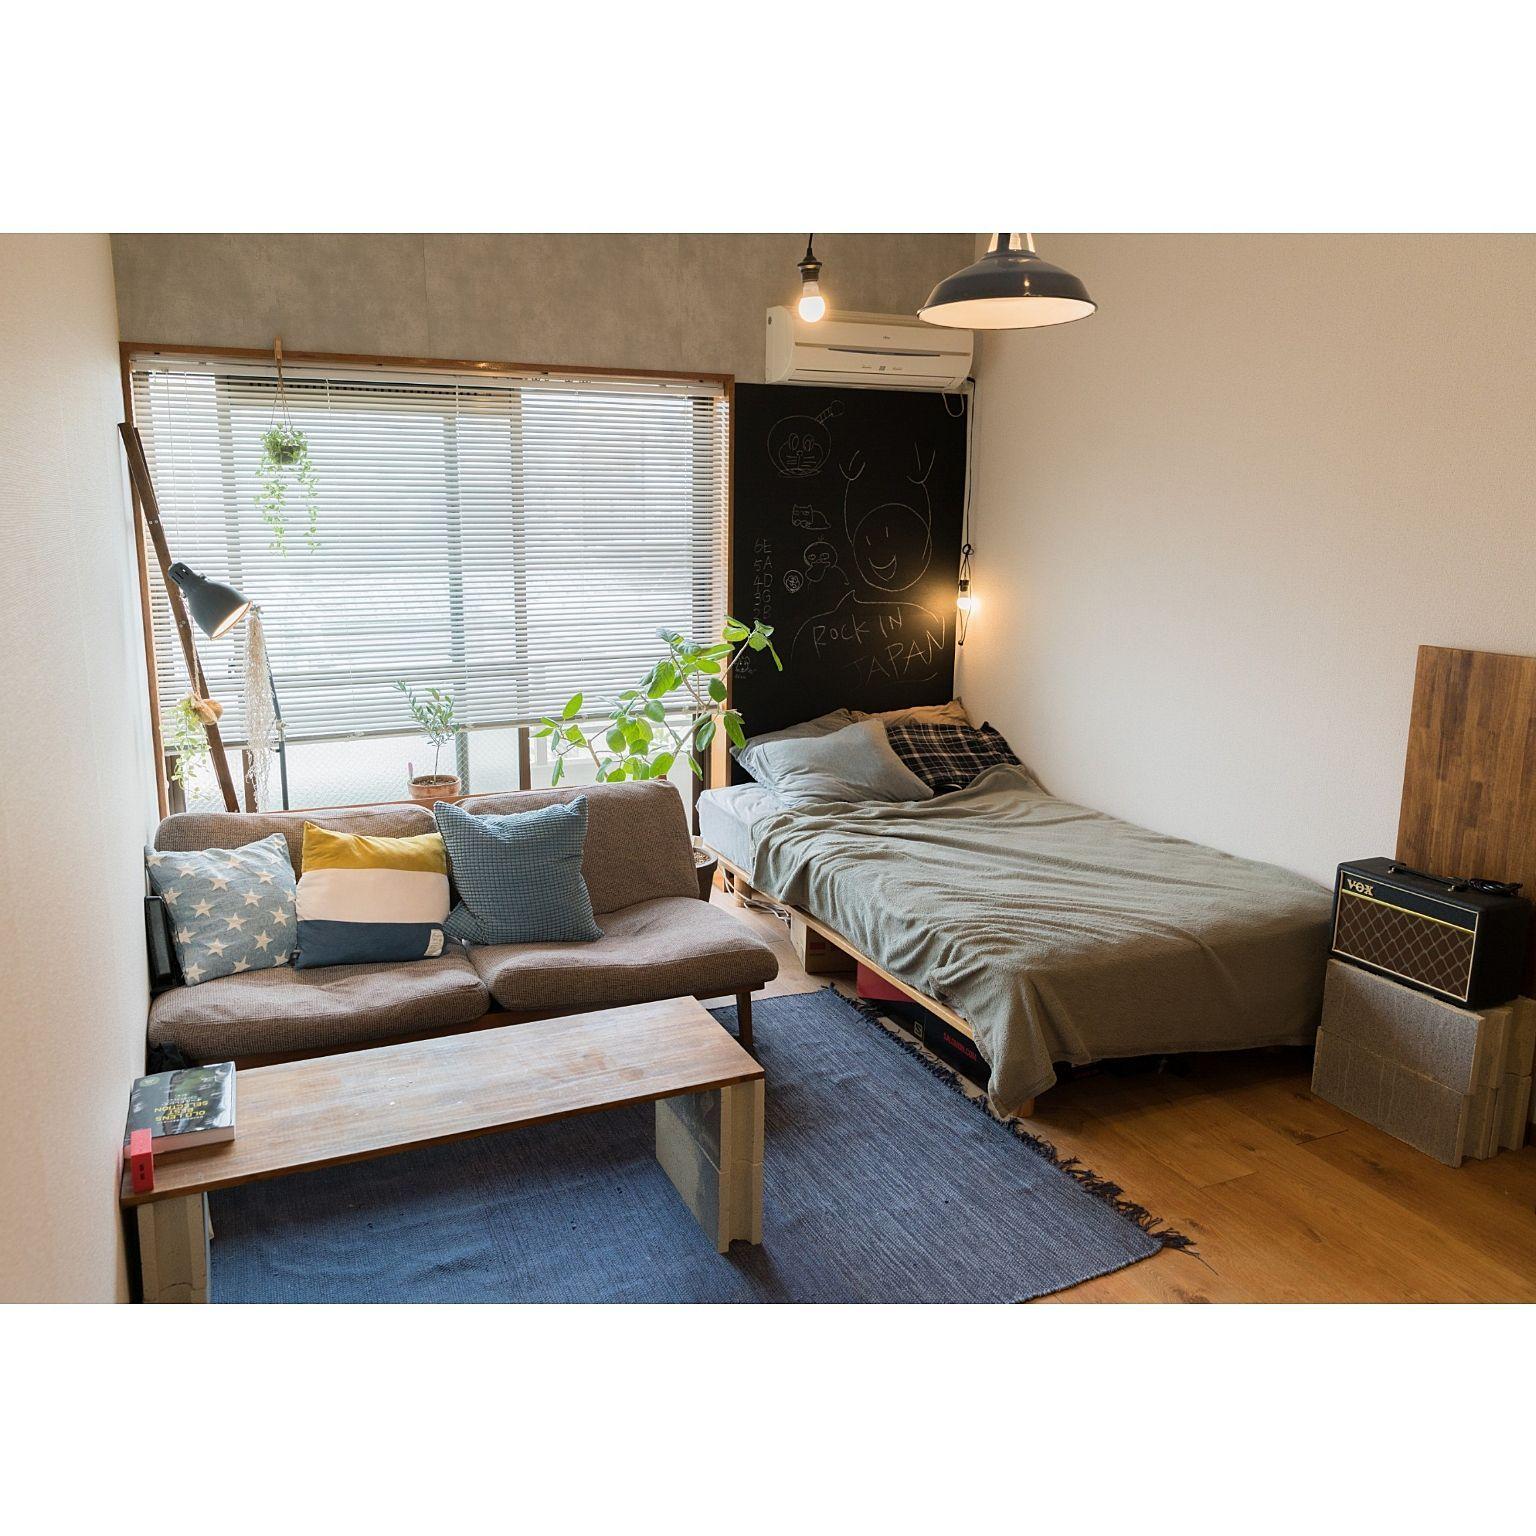 1kのお部屋どうしてる 6 8畳のお役立ちレイアウト実例 2020 一人暮らし部屋レイアウト 狭い部屋 インテリア 部屋 レイアウト